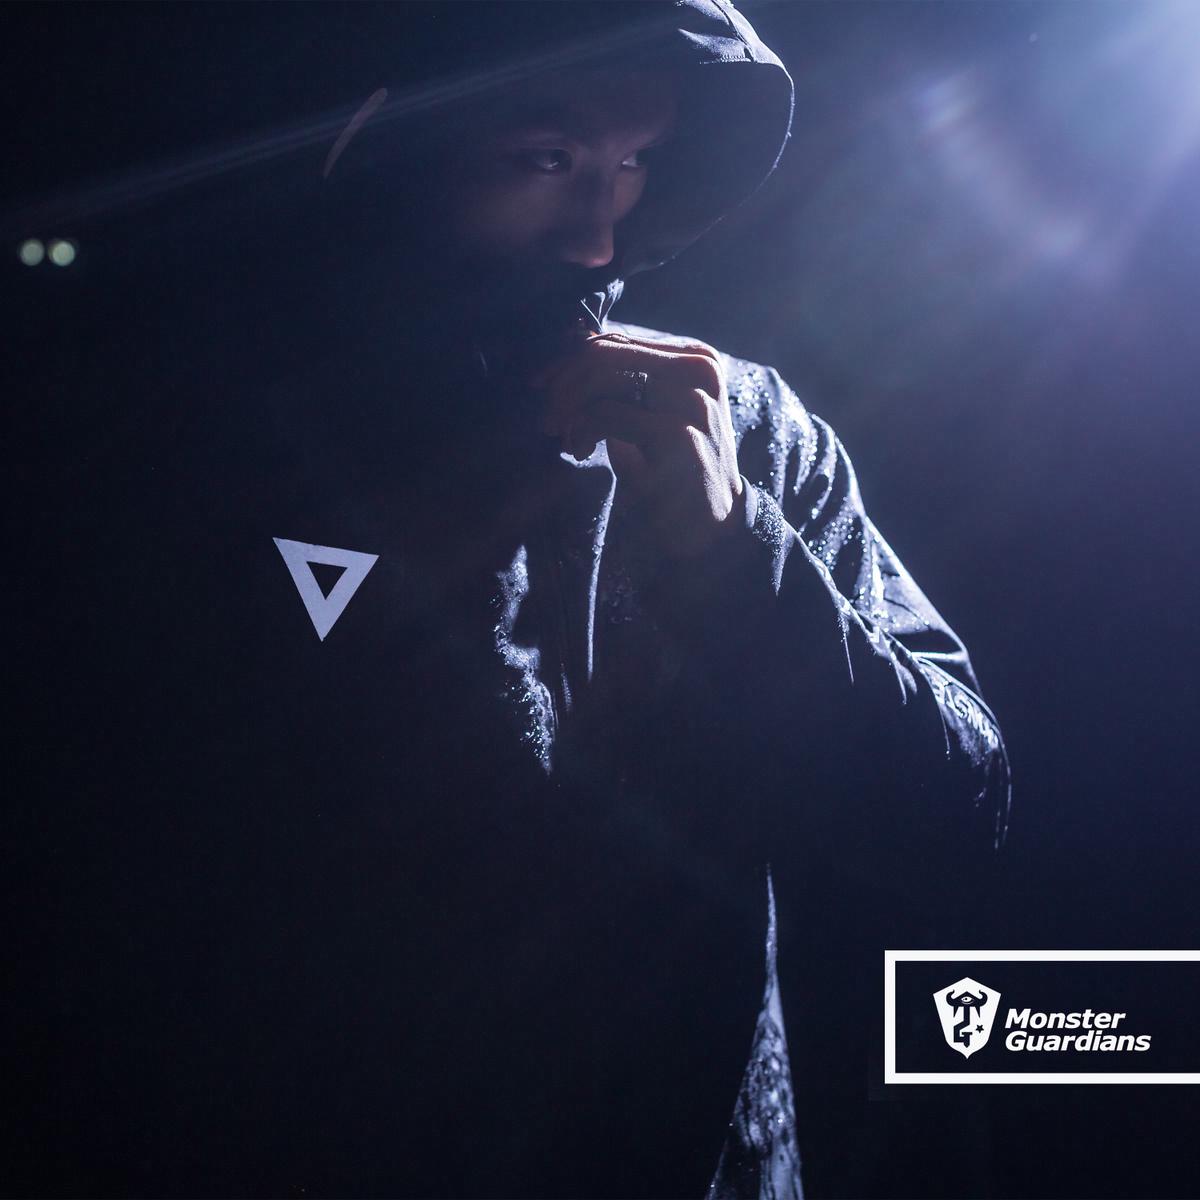 Monster Guardians 男原創設計運動外套防風雨夾克軟殼反光衝鋒衣